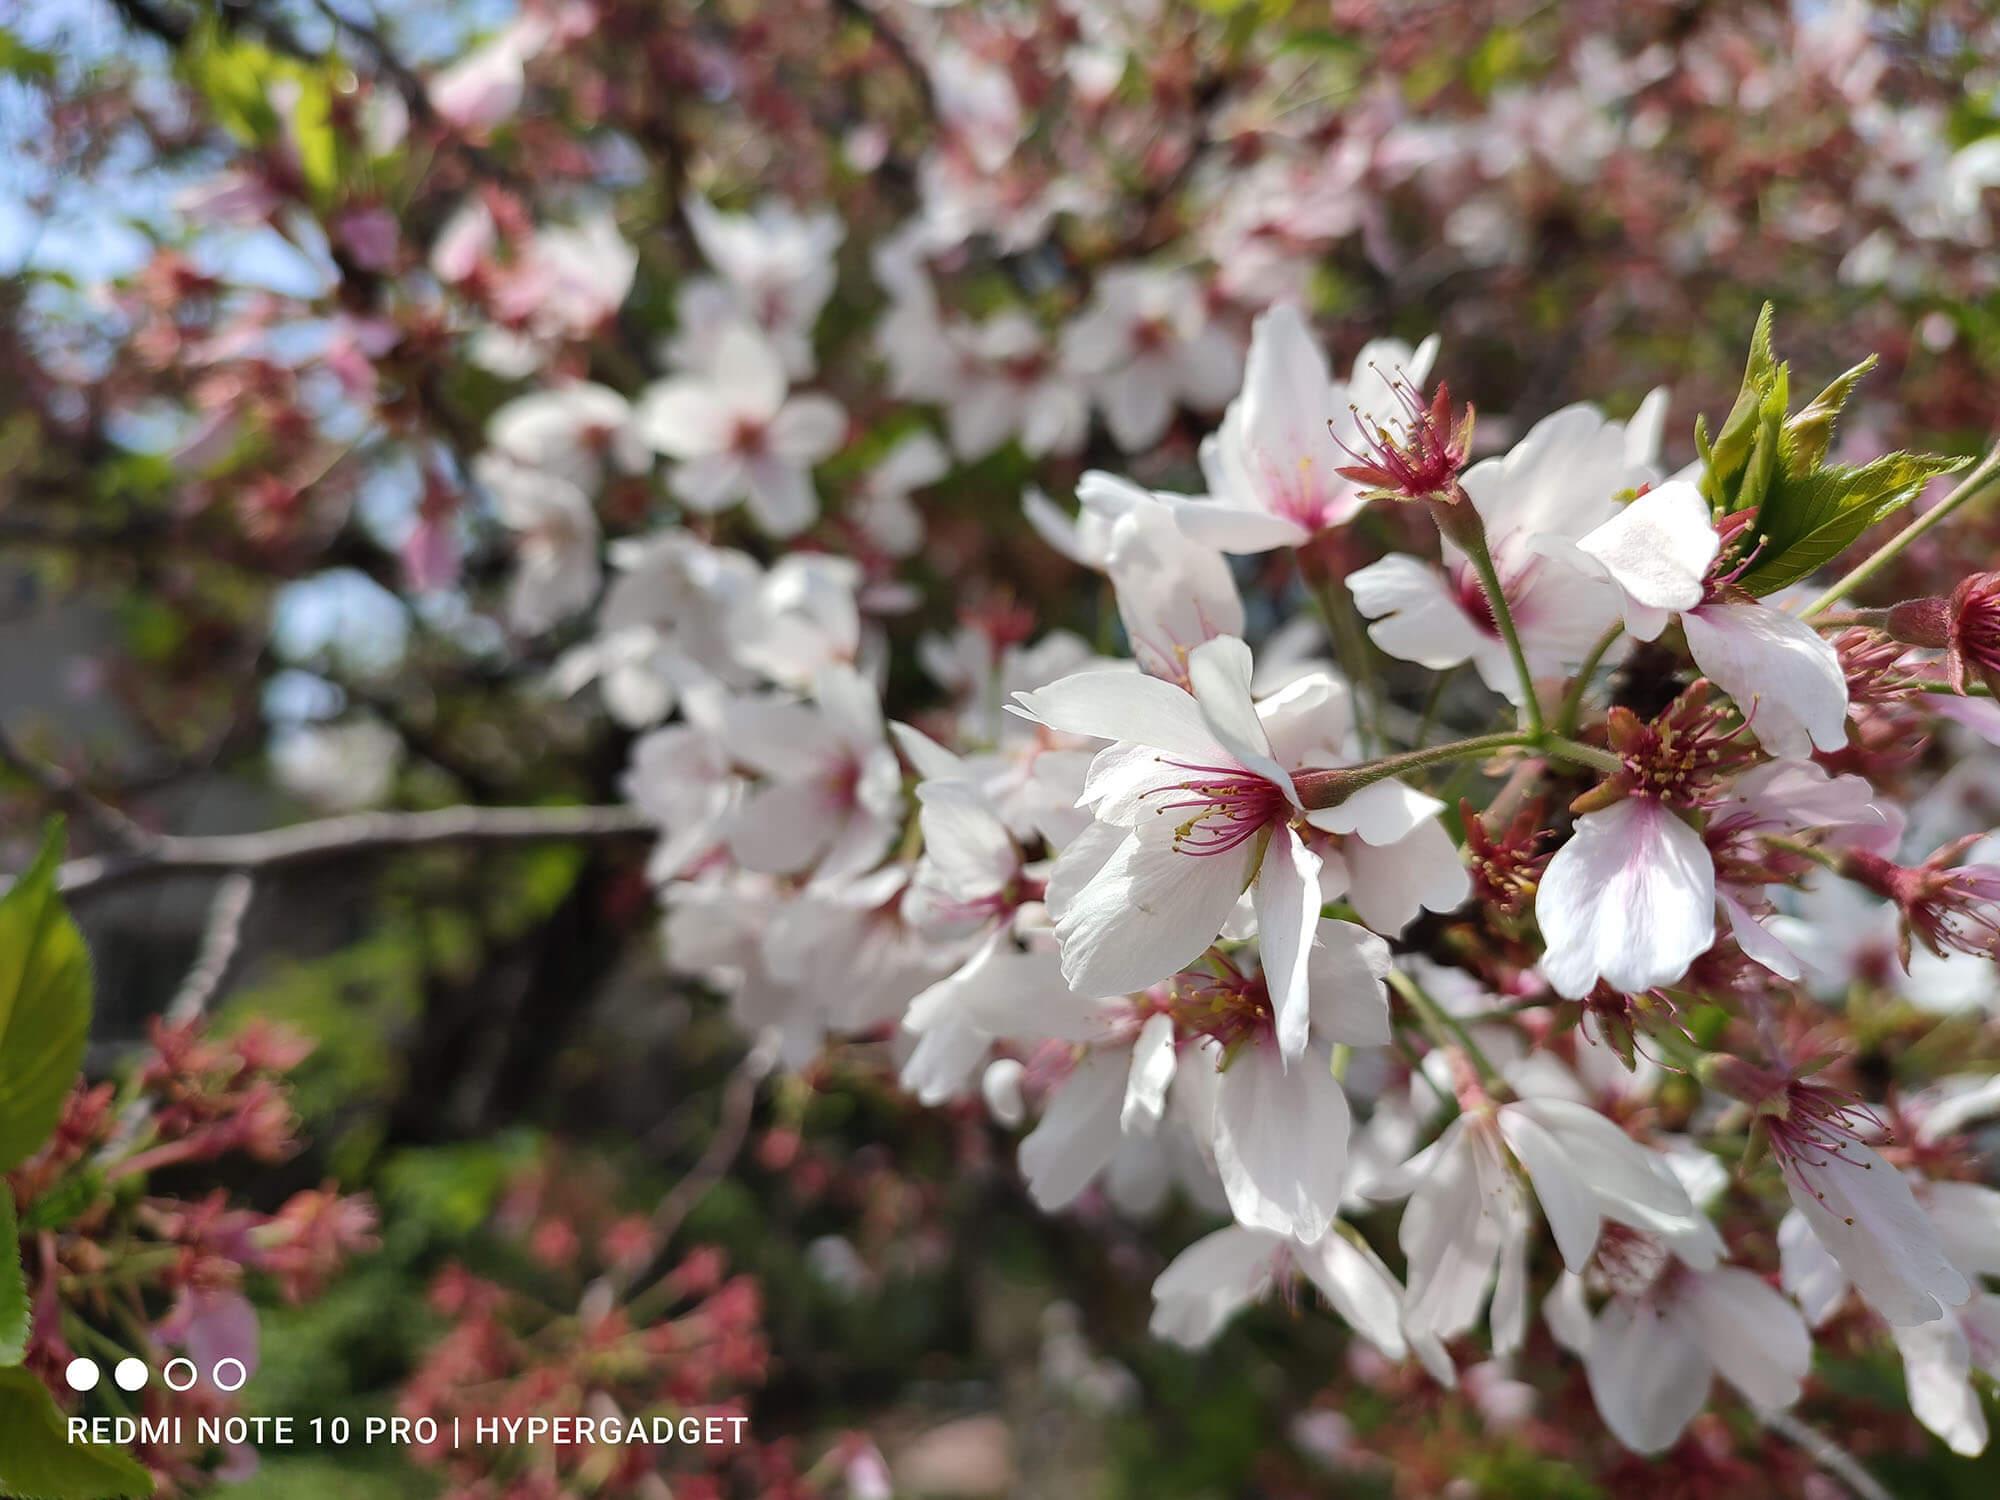 Redmi Note 10 Proで撮影した桜の画像